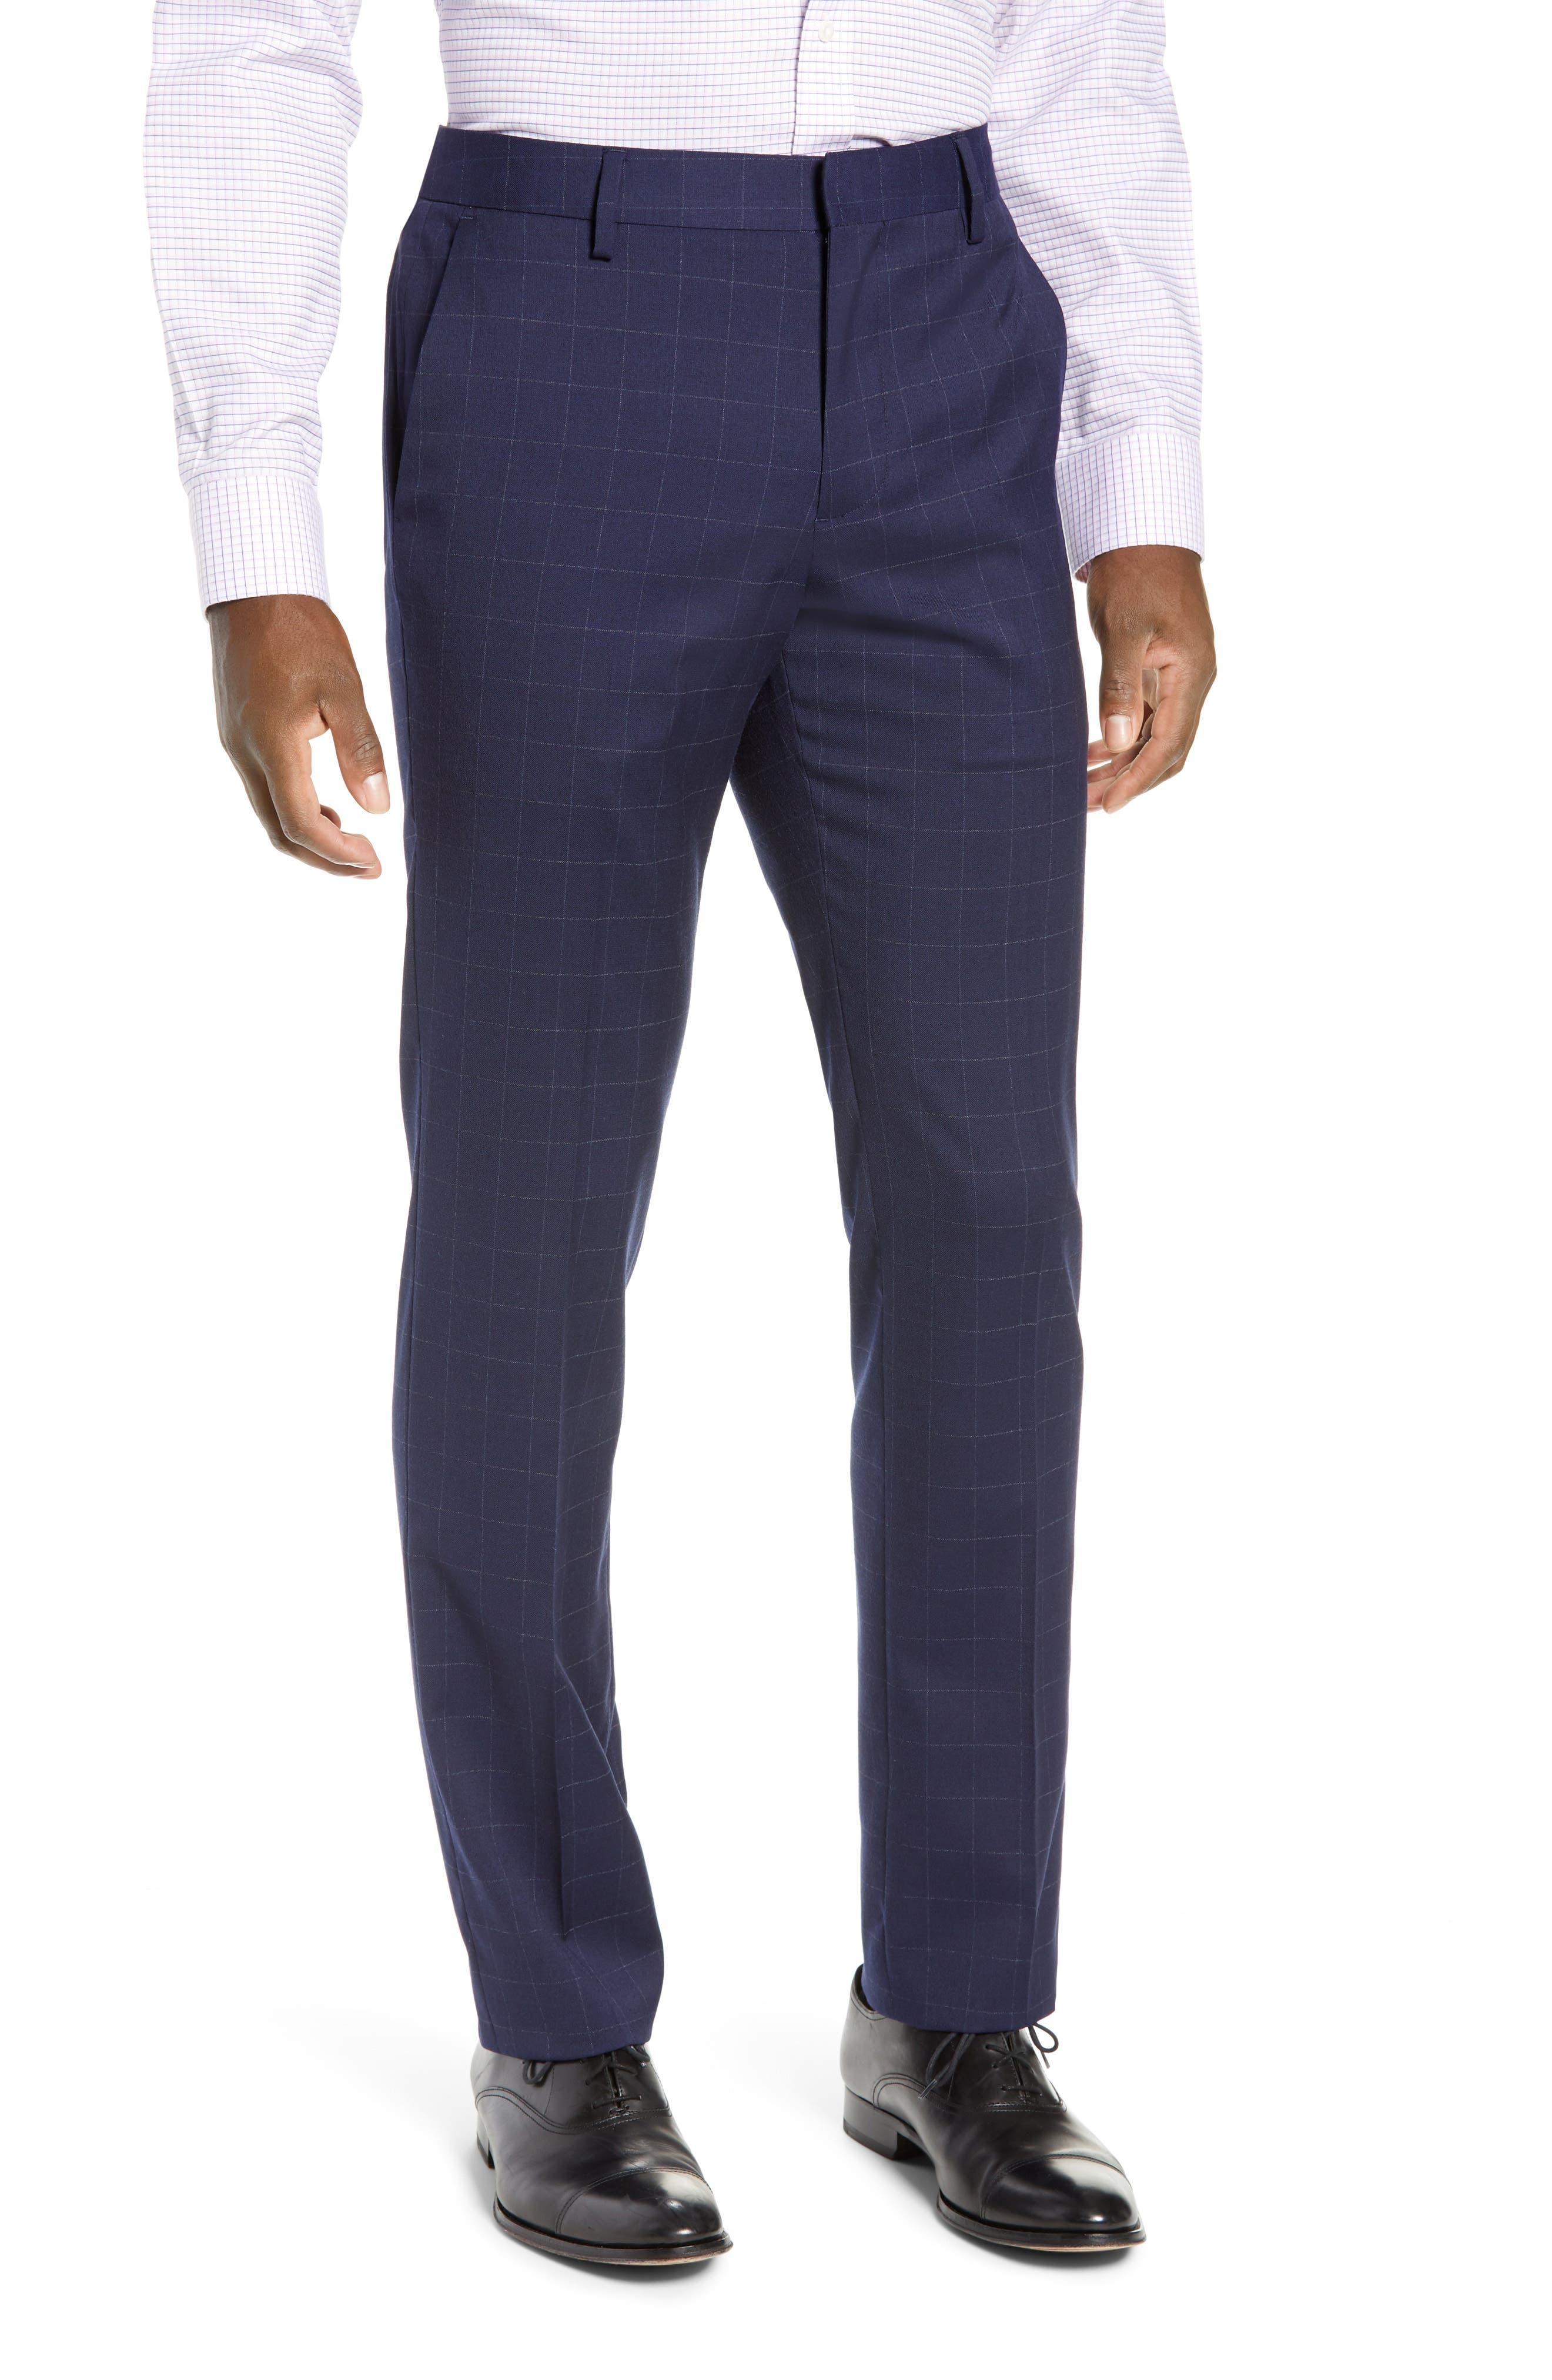 BONOBOS, Jetsetter Slim Fit Stretch Suit Pants, Main thumbnail 1, color, NAVY CHALK WINDOWPANE